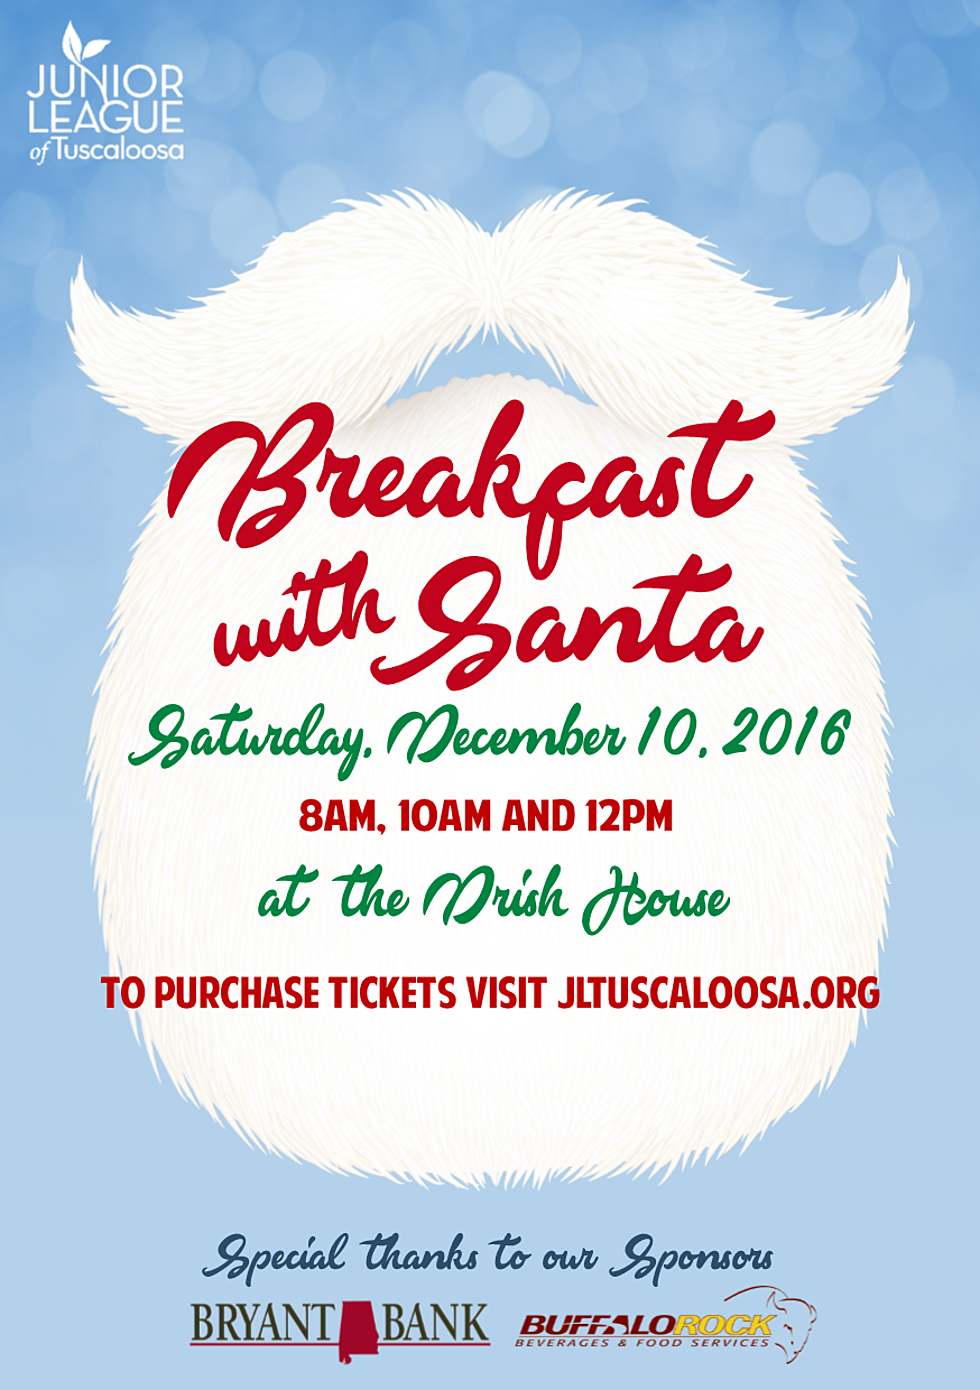 Junior League of Tuscaloosa Hosting Breakfast with Santa